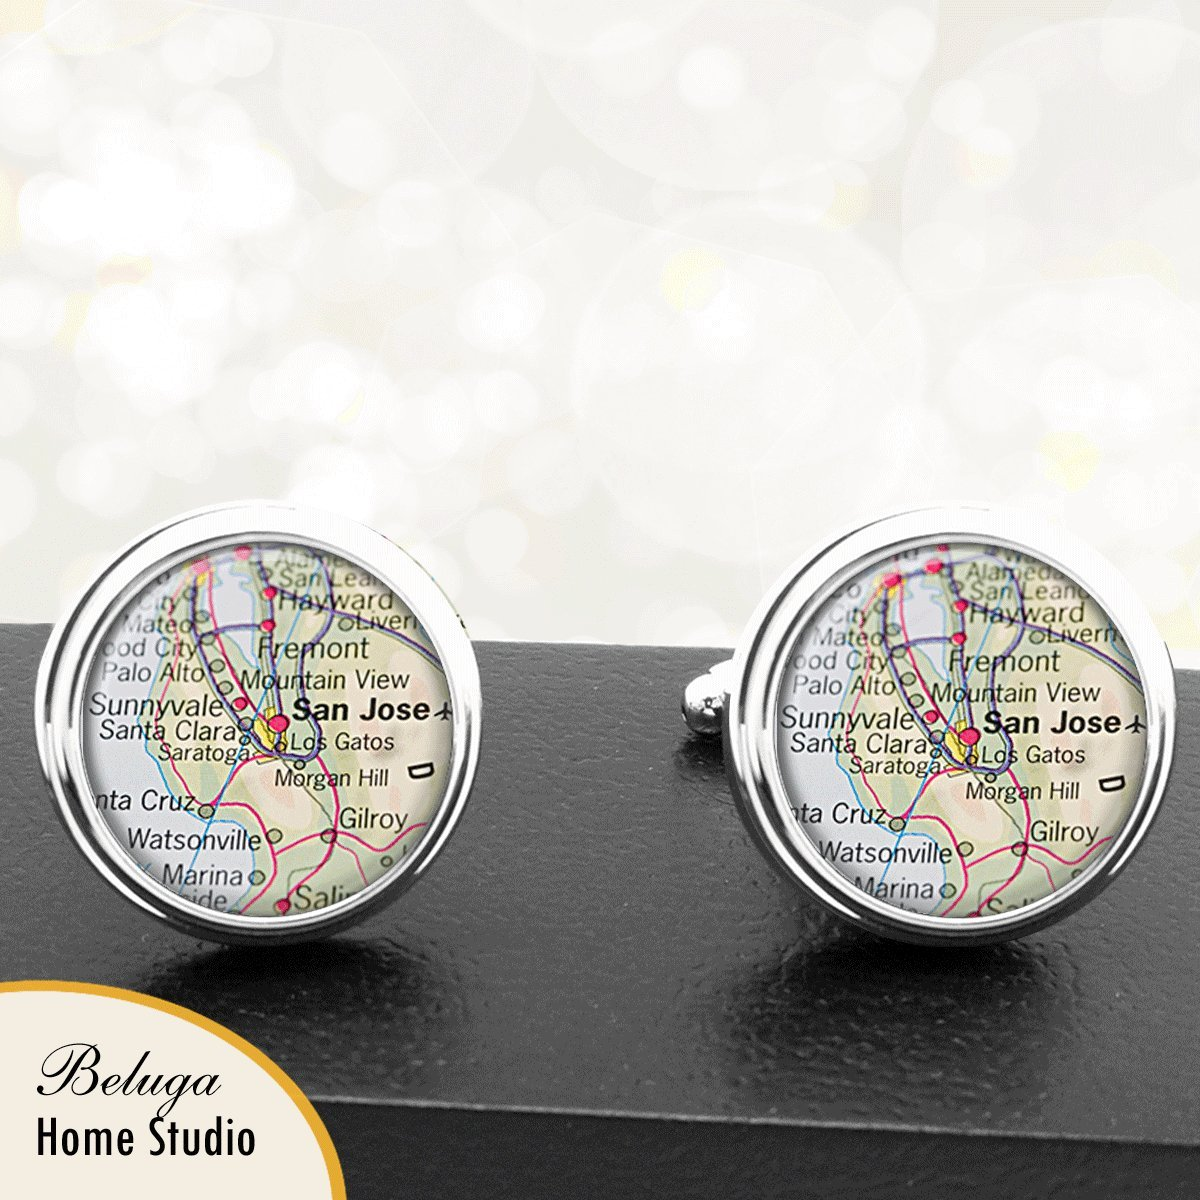 Amazon.com: Handmade Map Cuff Links San Jose CA USA City Cuff Links State of California: Handmade